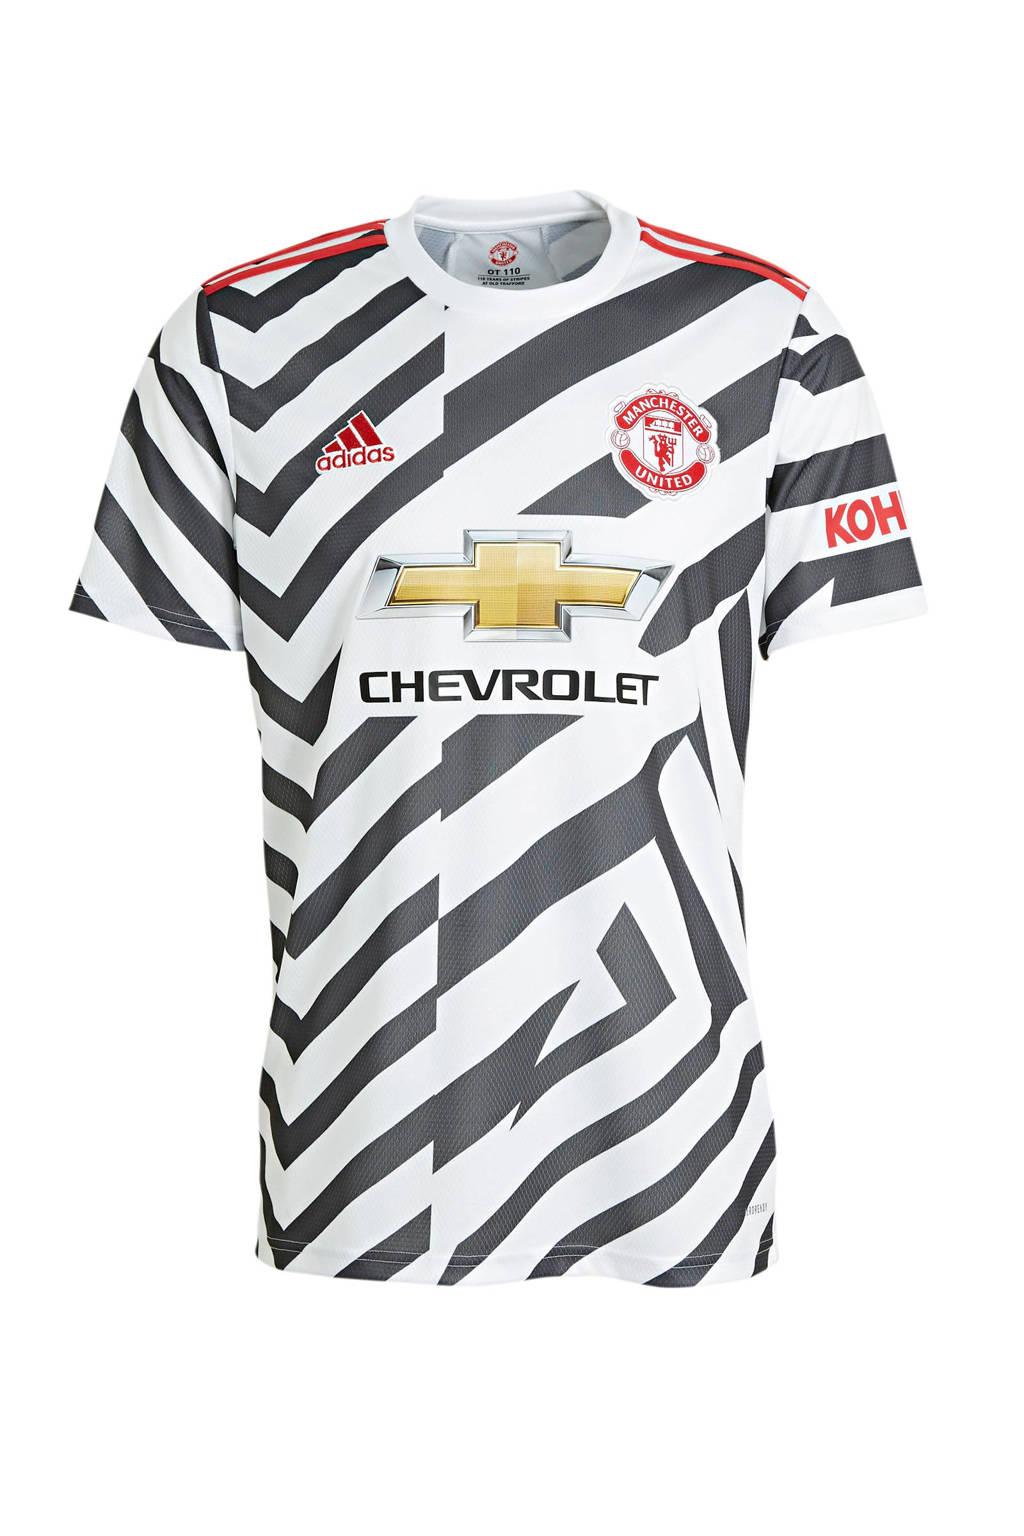 adidas Performance Senior Manchester United 3e shirt wit/zwart, Wit/zwart